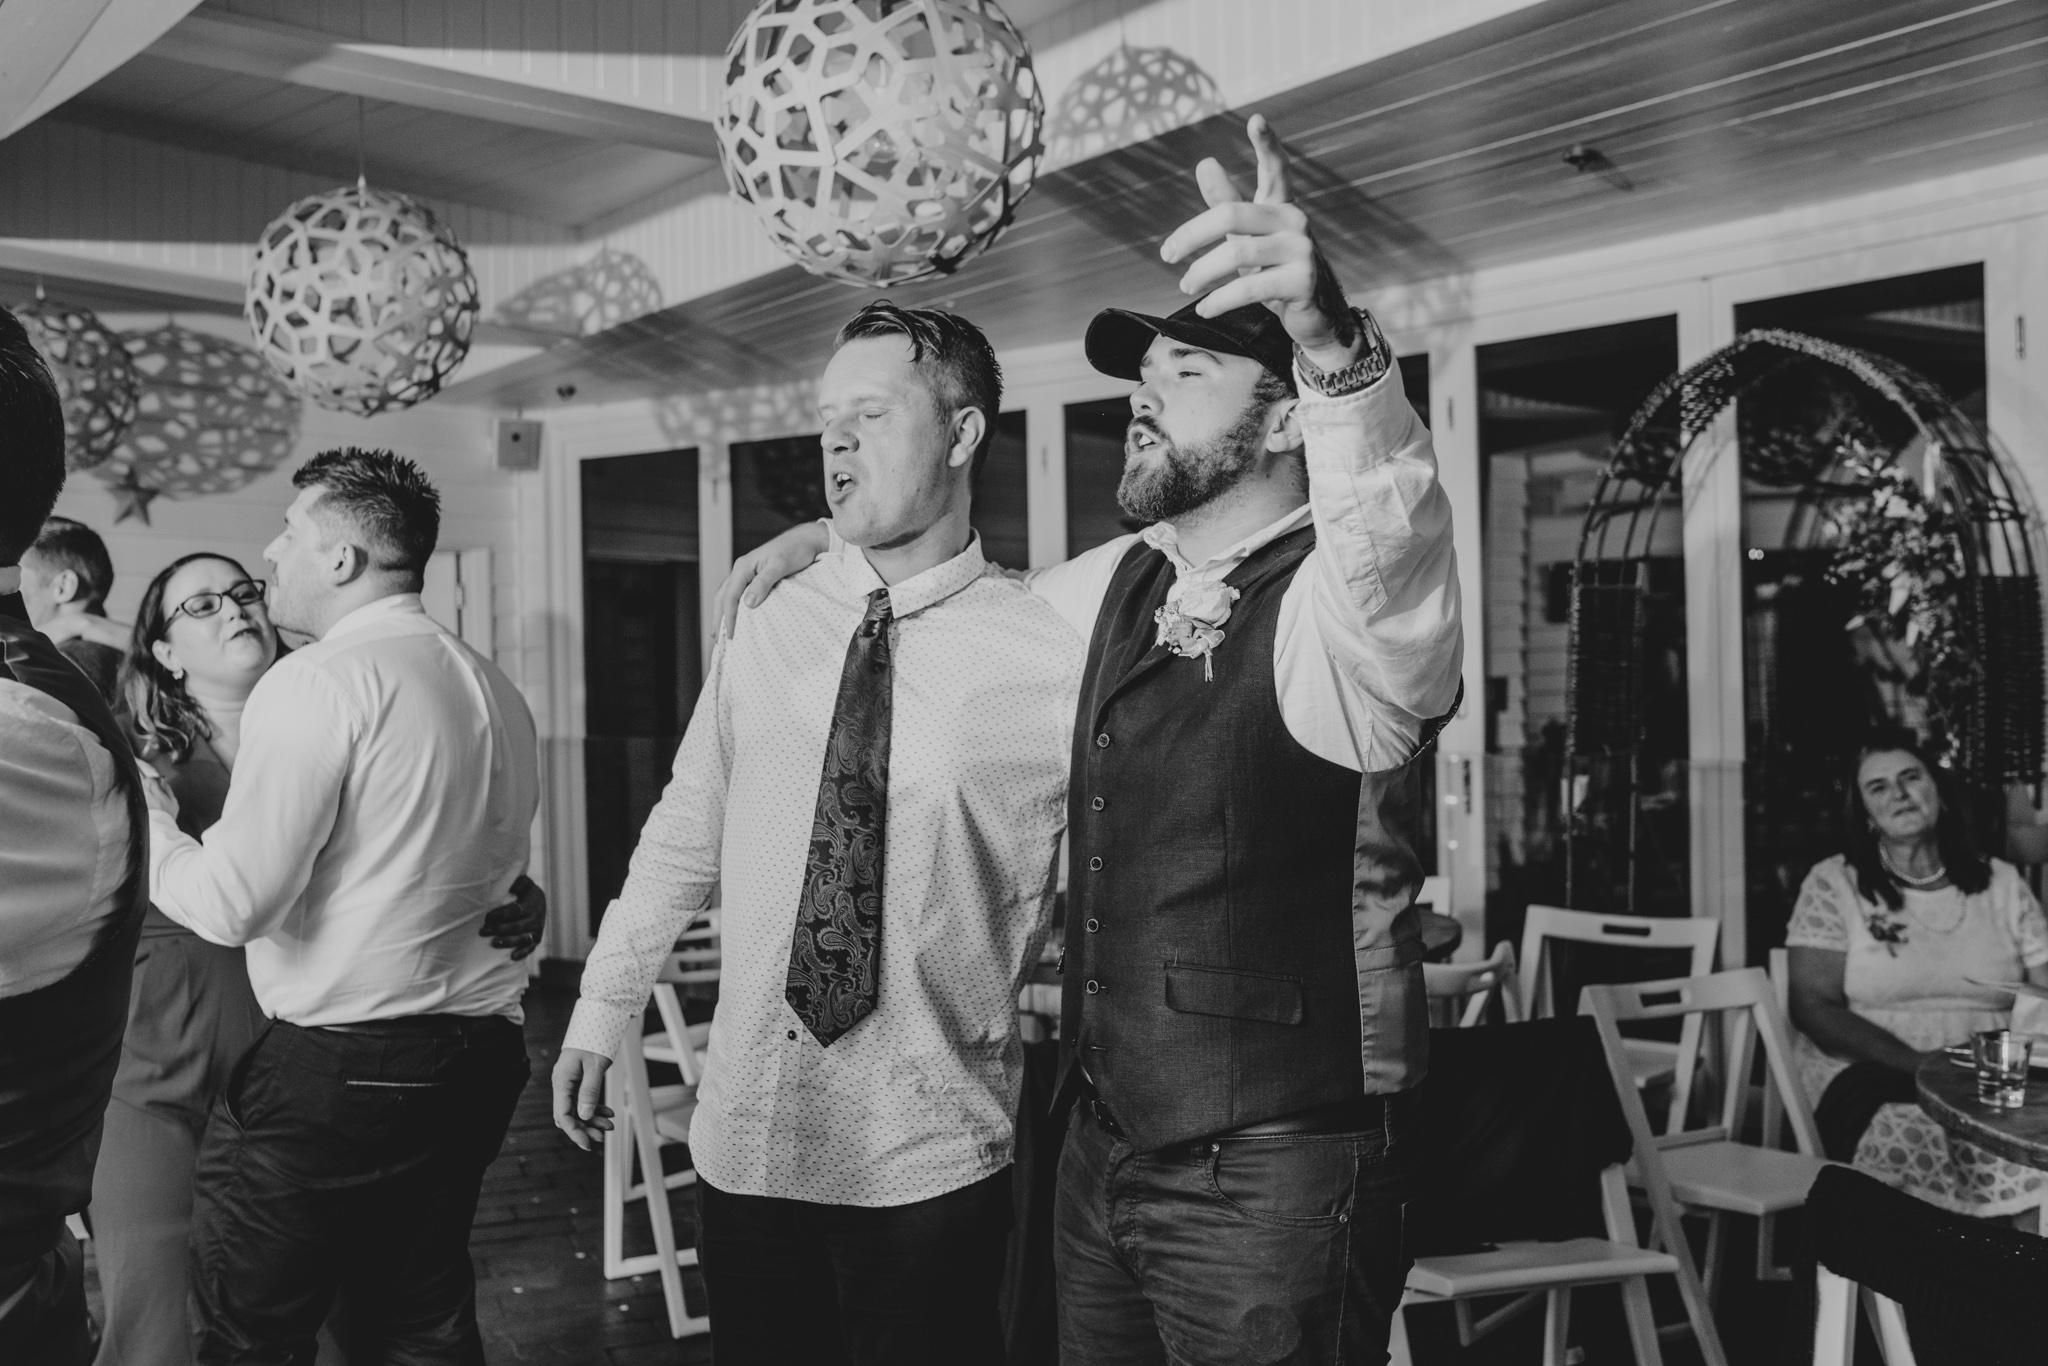 john-amy-relaxed-beach-wedding-tunnels-beaches-ilfracombe-north-devon-grace-elizabeth-colchester-essex-alternative-relaxed-wedding-photography-devon-suffolk-norfolk-essex (155 of 159).jpg